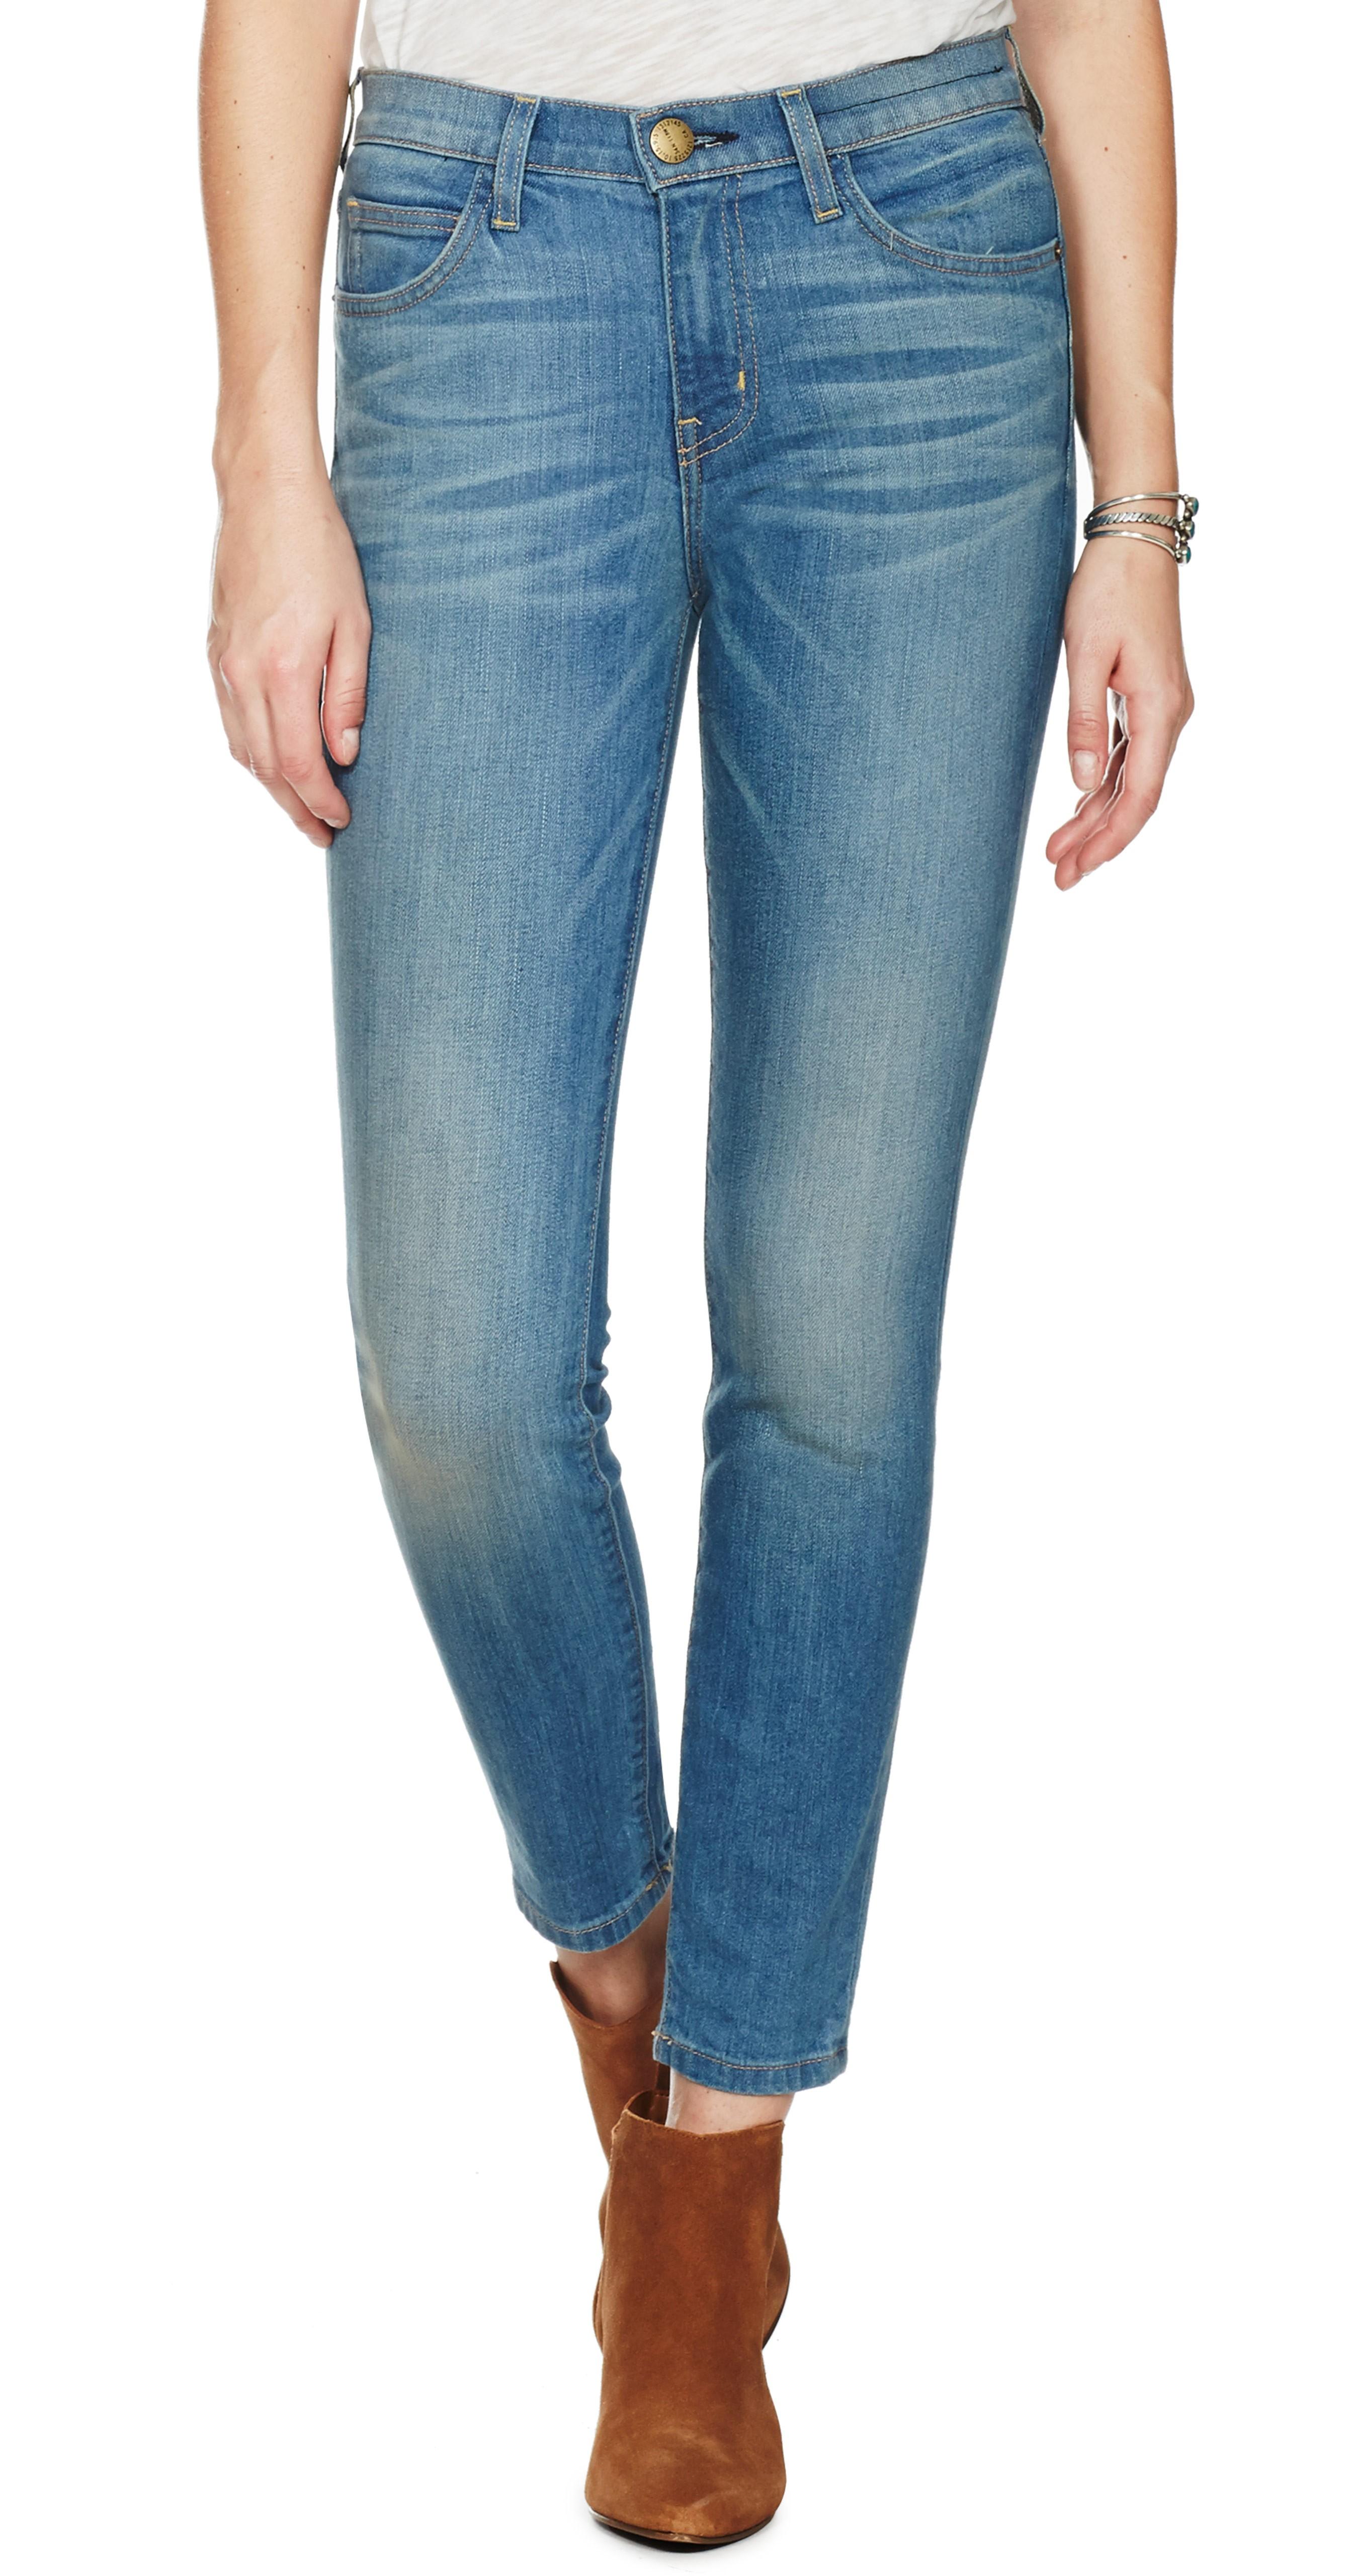 Current/elliott Woman High-rise Skinny Jeans Midnight Blue Size 24 Current Elliott Buy Cheap Marketable Q8VQQIYe